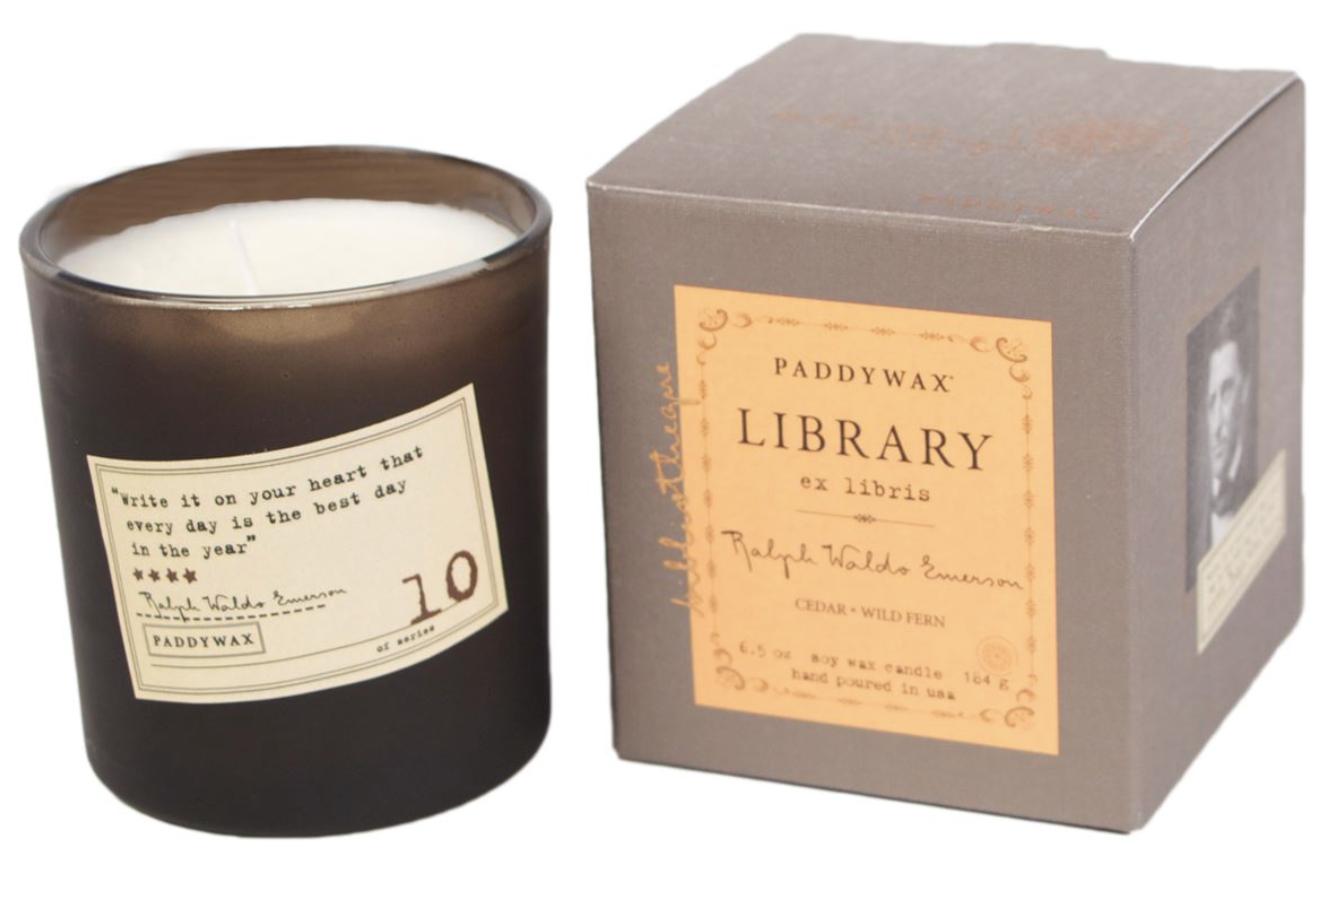 Paddywax Library Candle, Ralph Waldo Emerson, 6.5oz